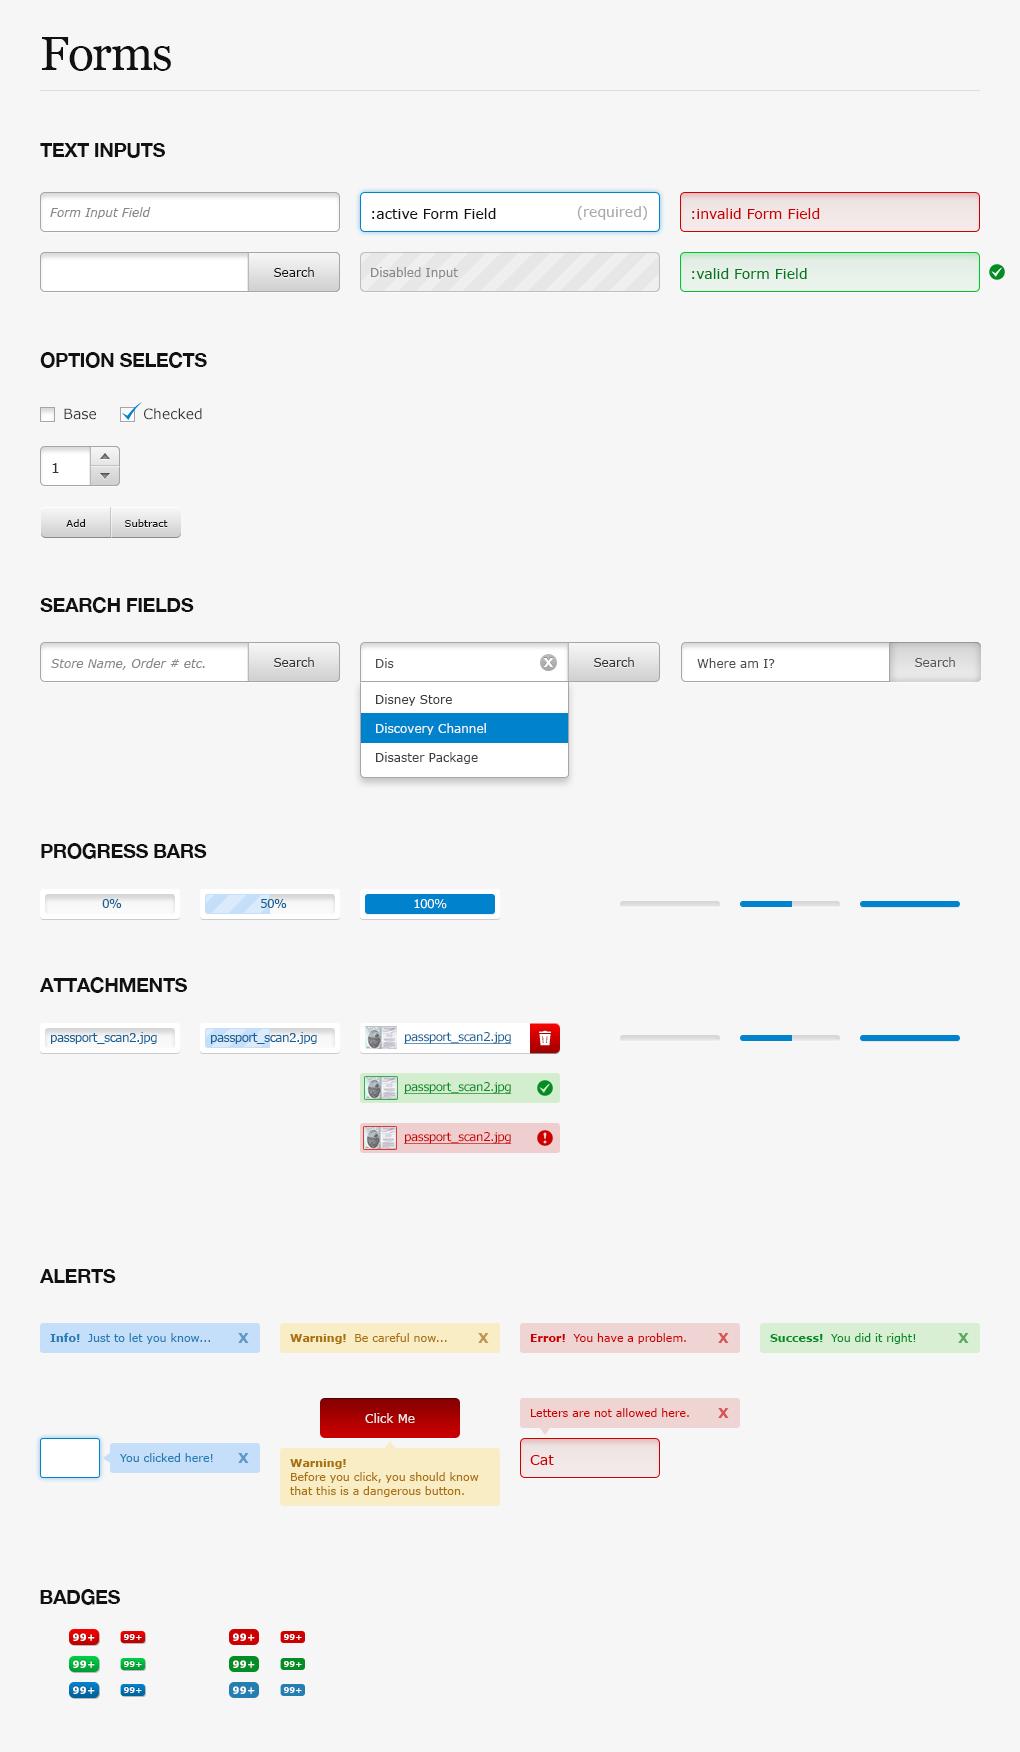 Shopfans Desktop Web App Forms Styleguide